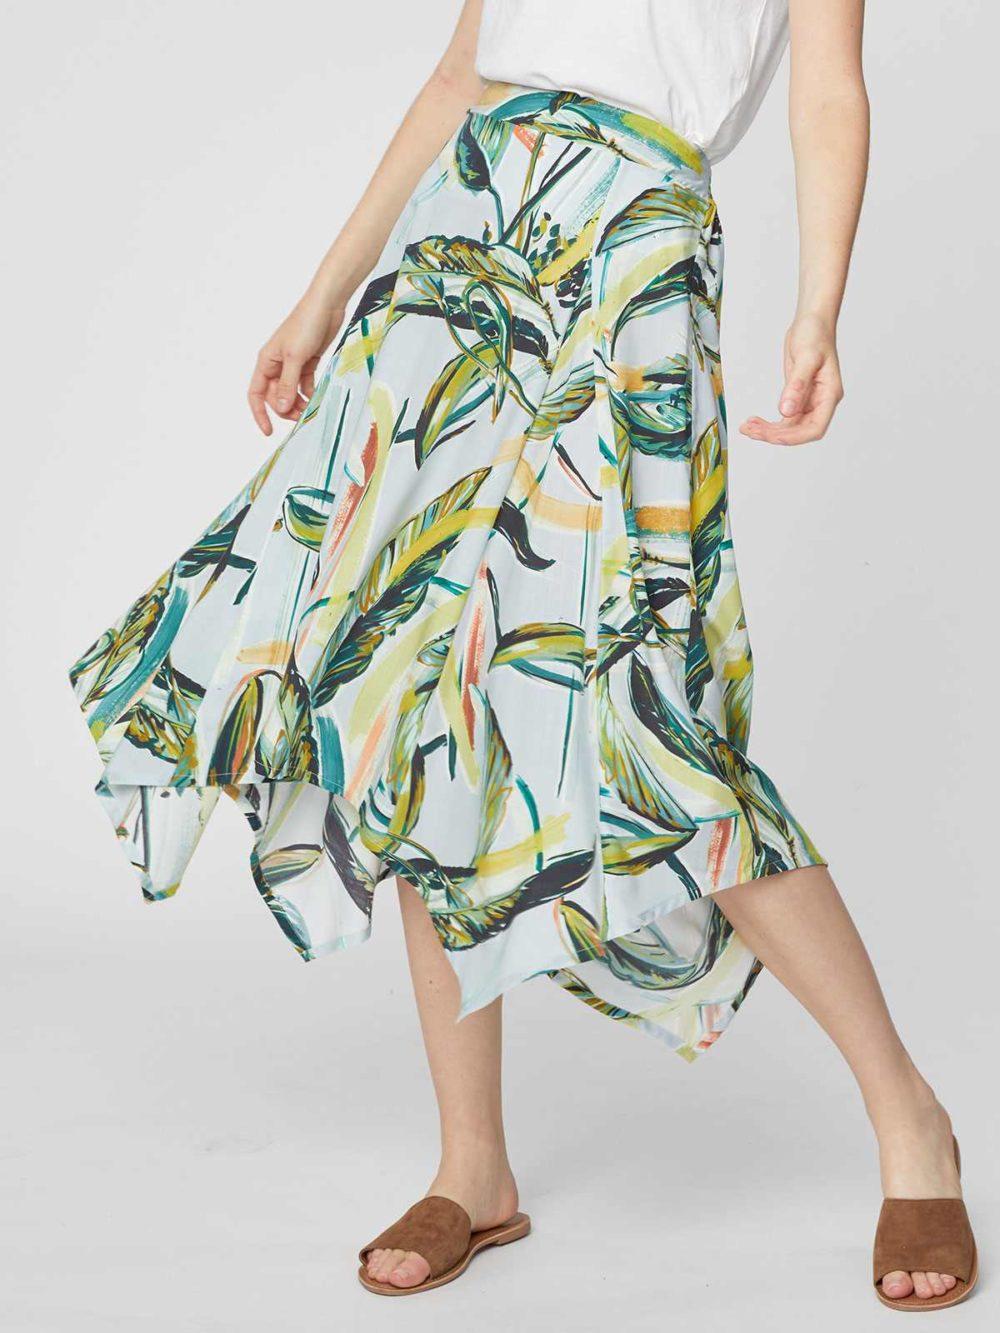 WSB4183 Garabina Skirt Thought Clothing Katie Kerr Womens Clothing